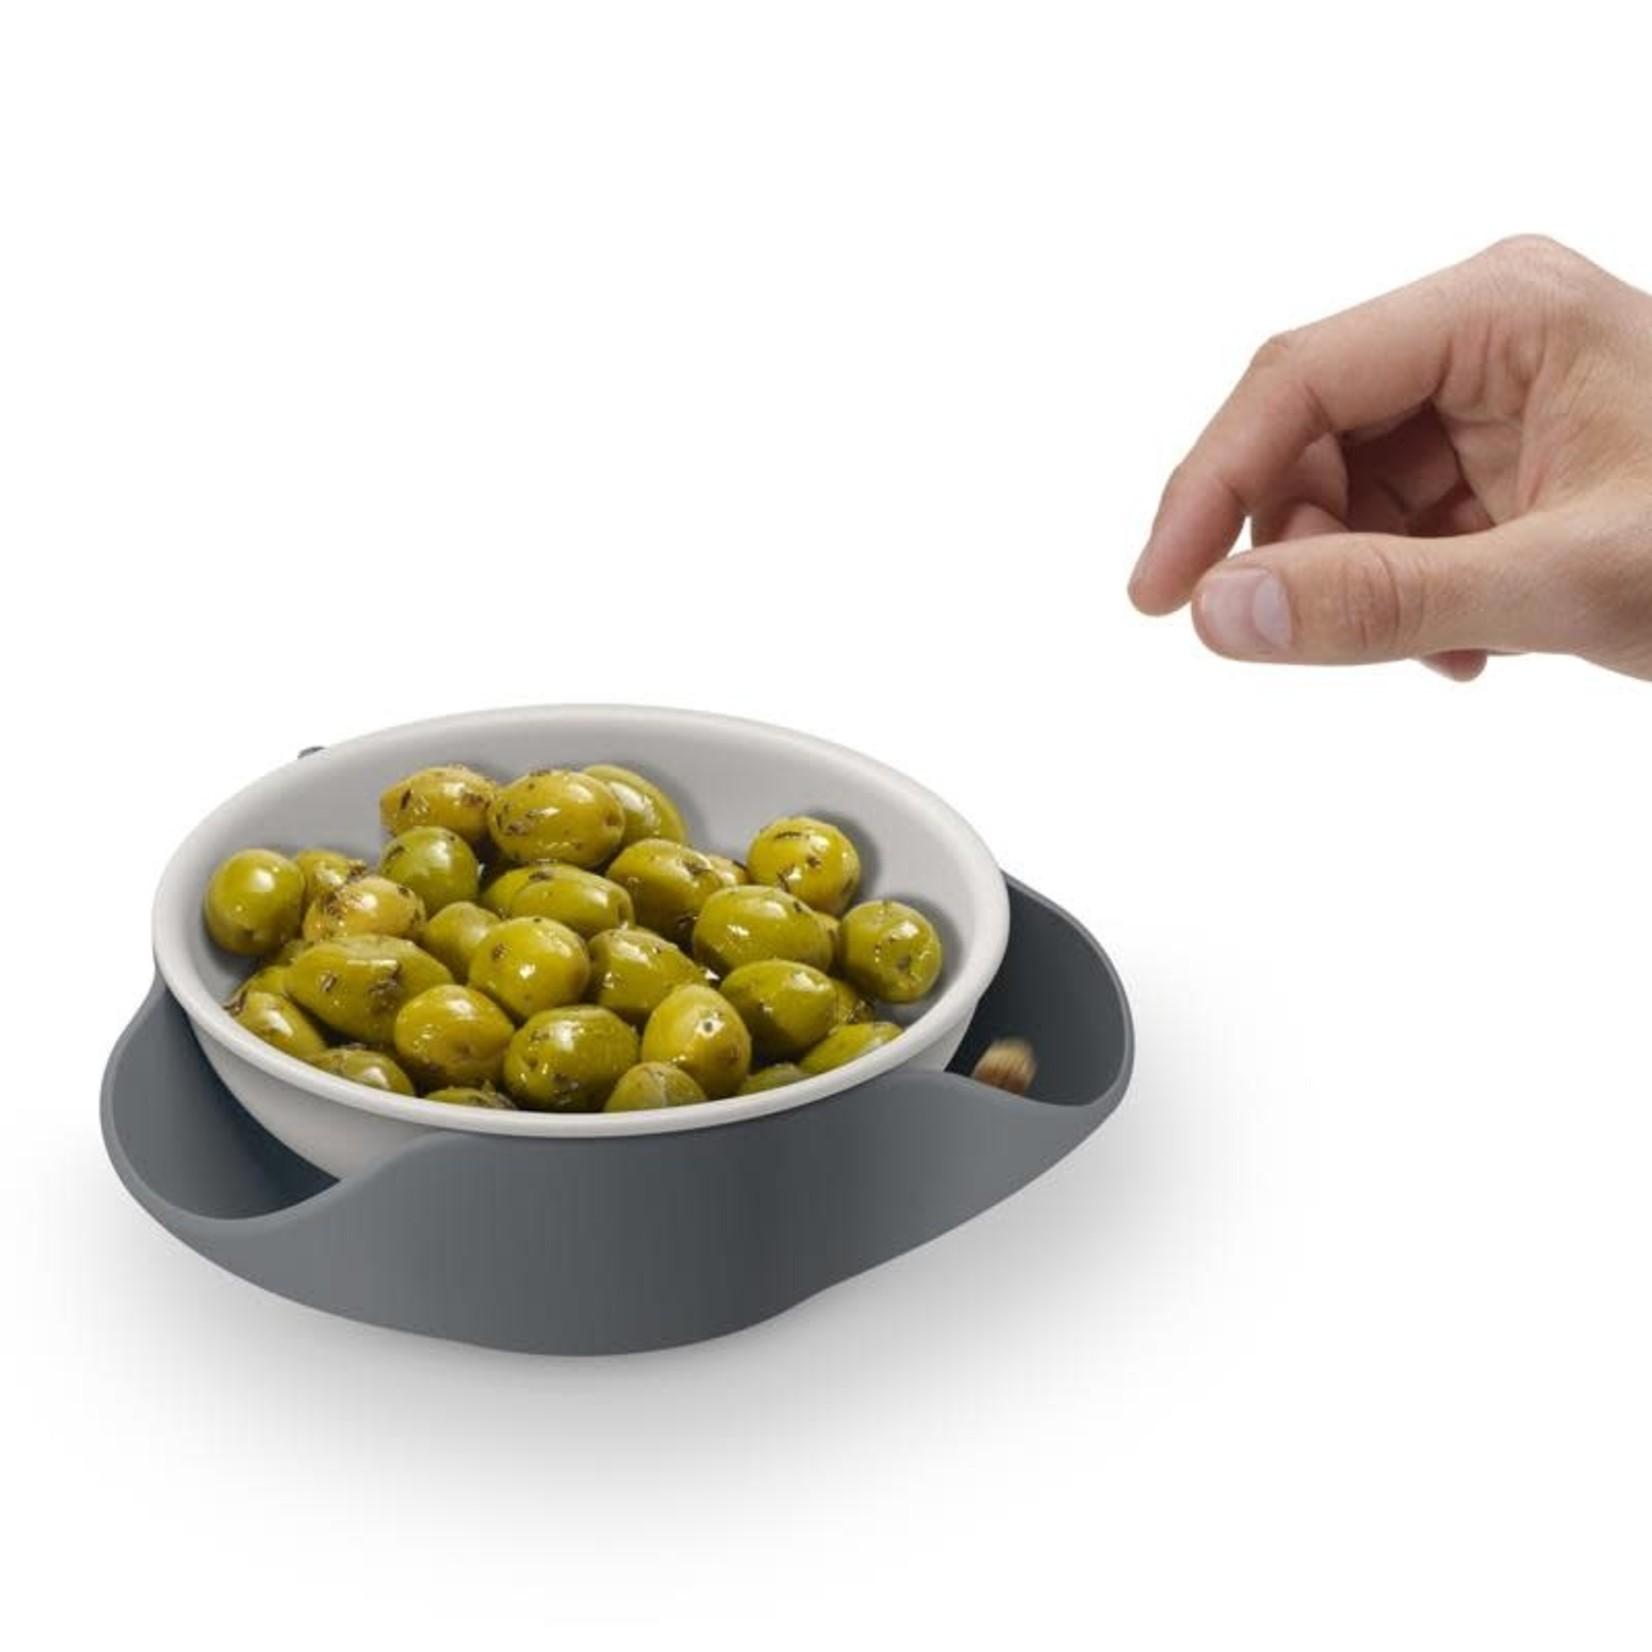 DoubleDish 2-tier Snack Bowl